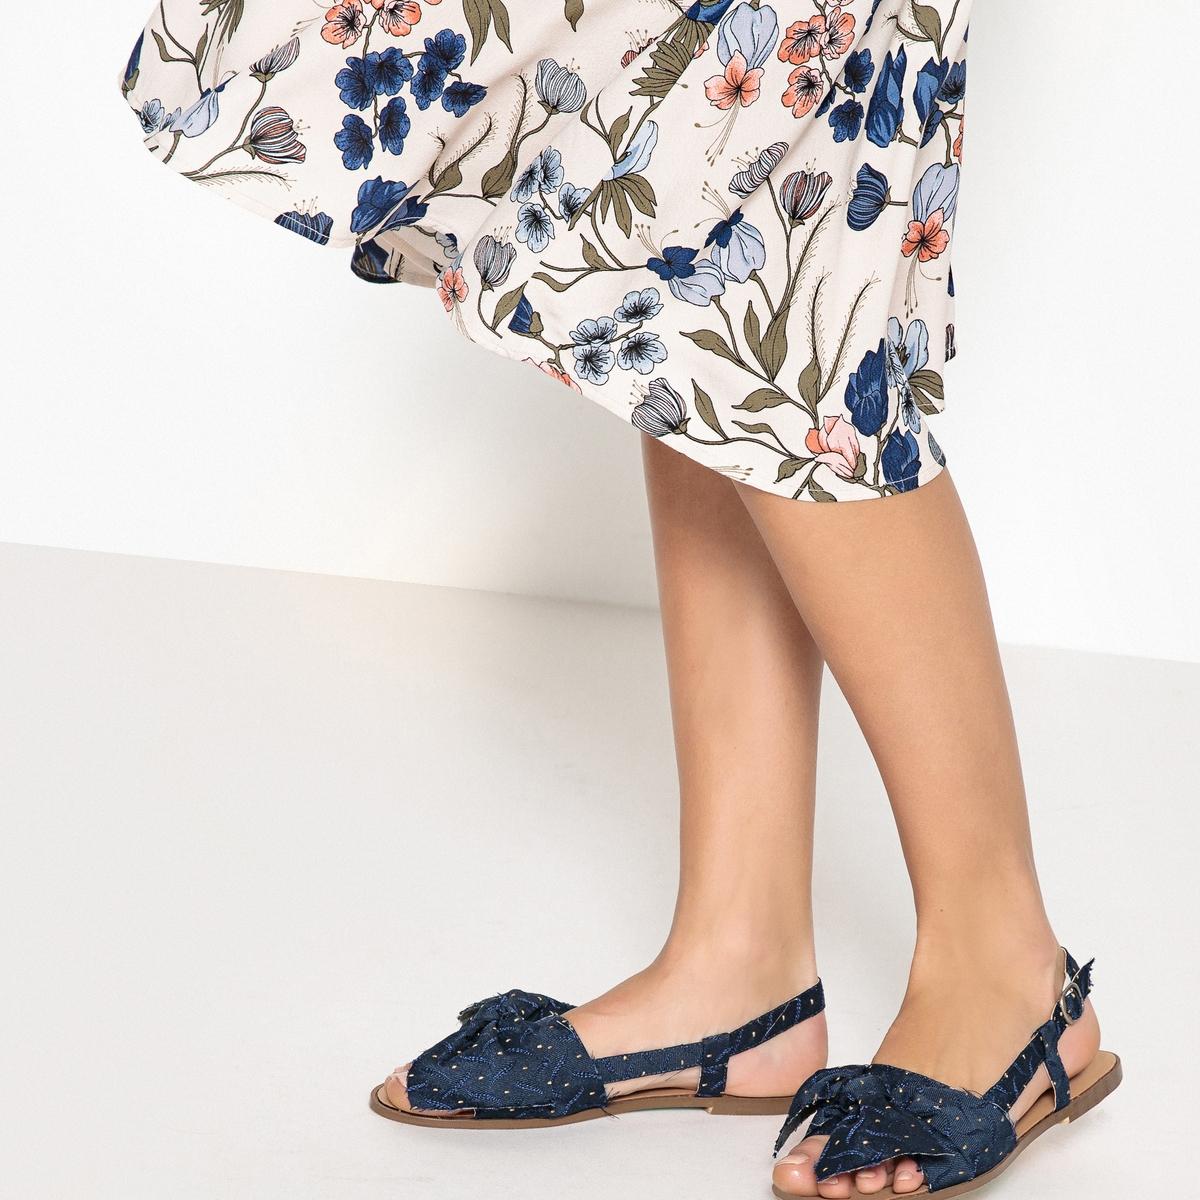 Sandalias de tejido anudadas